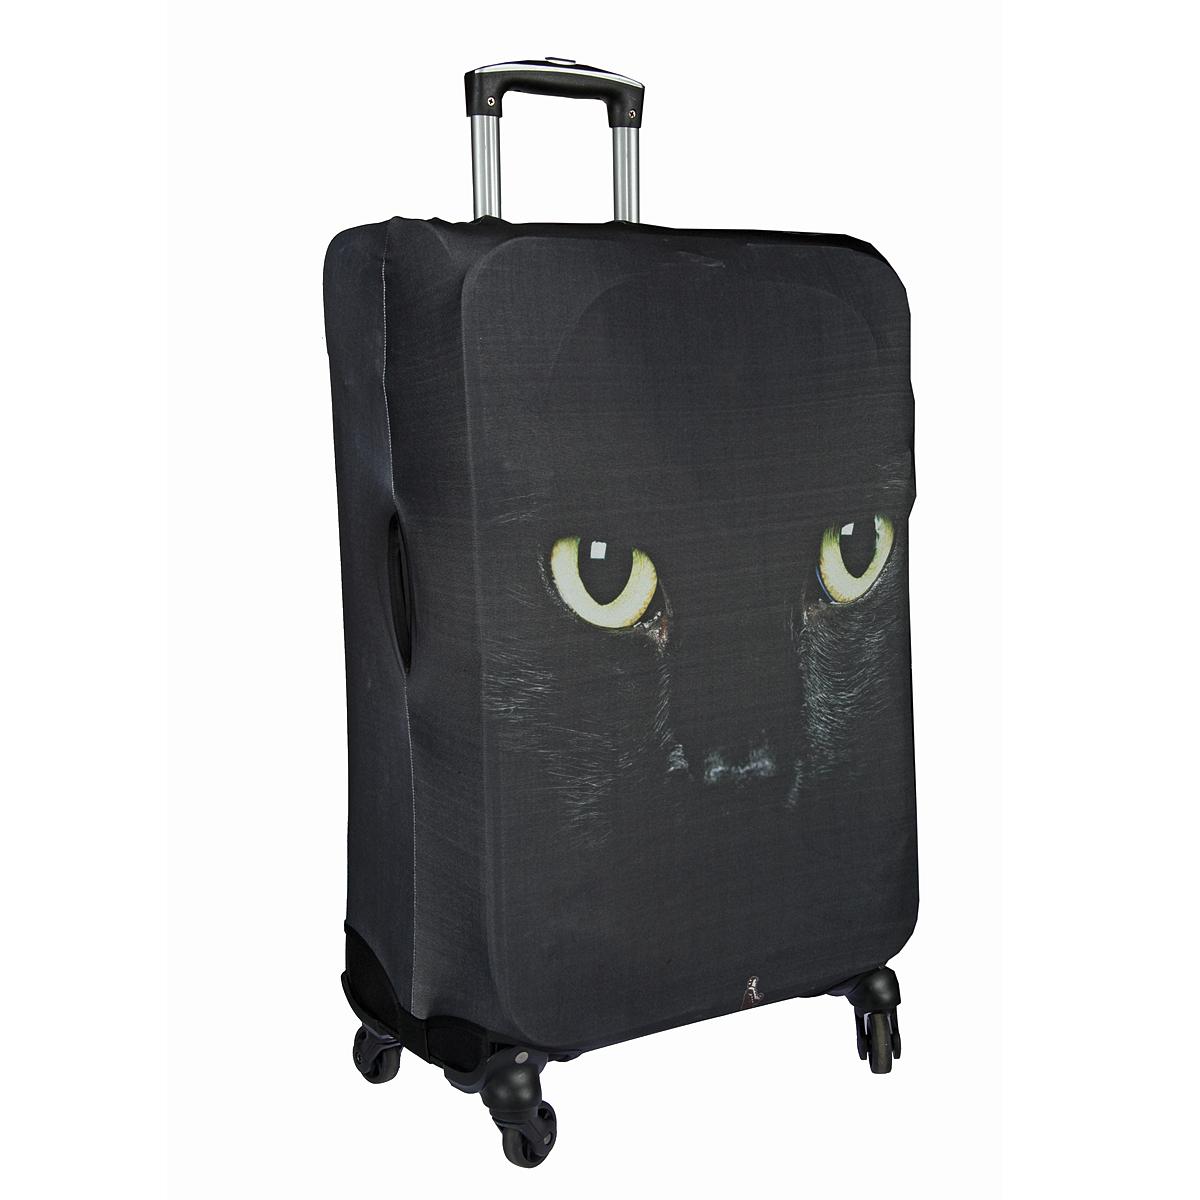 Защитное покрытие для чемодана Gianni Conti 9027 S.